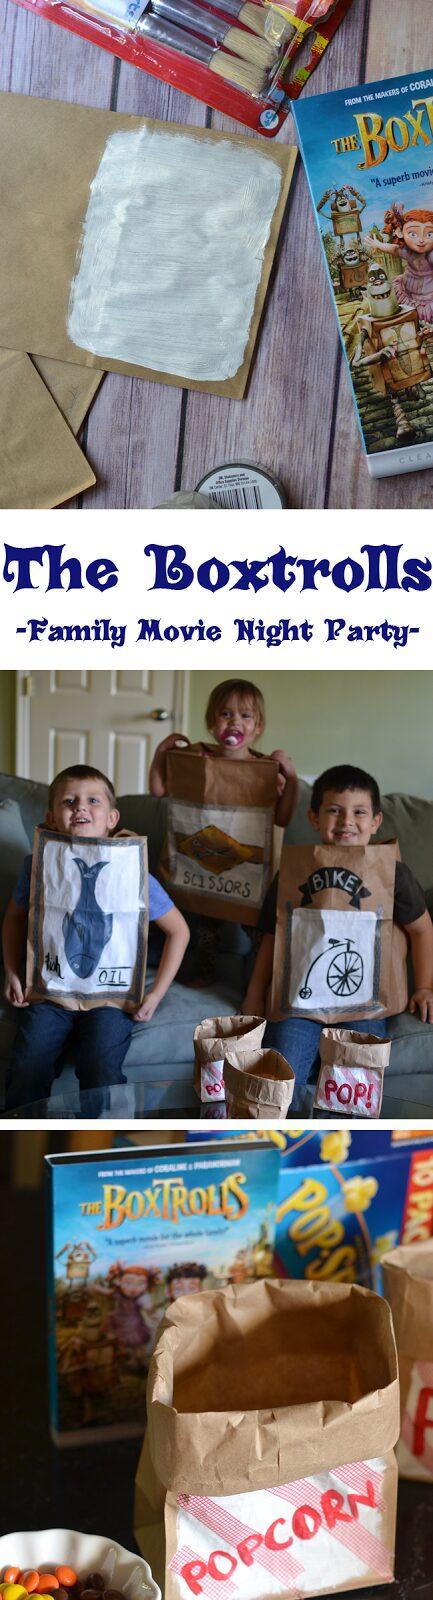 The Boxtrolls Family Movie Night Party